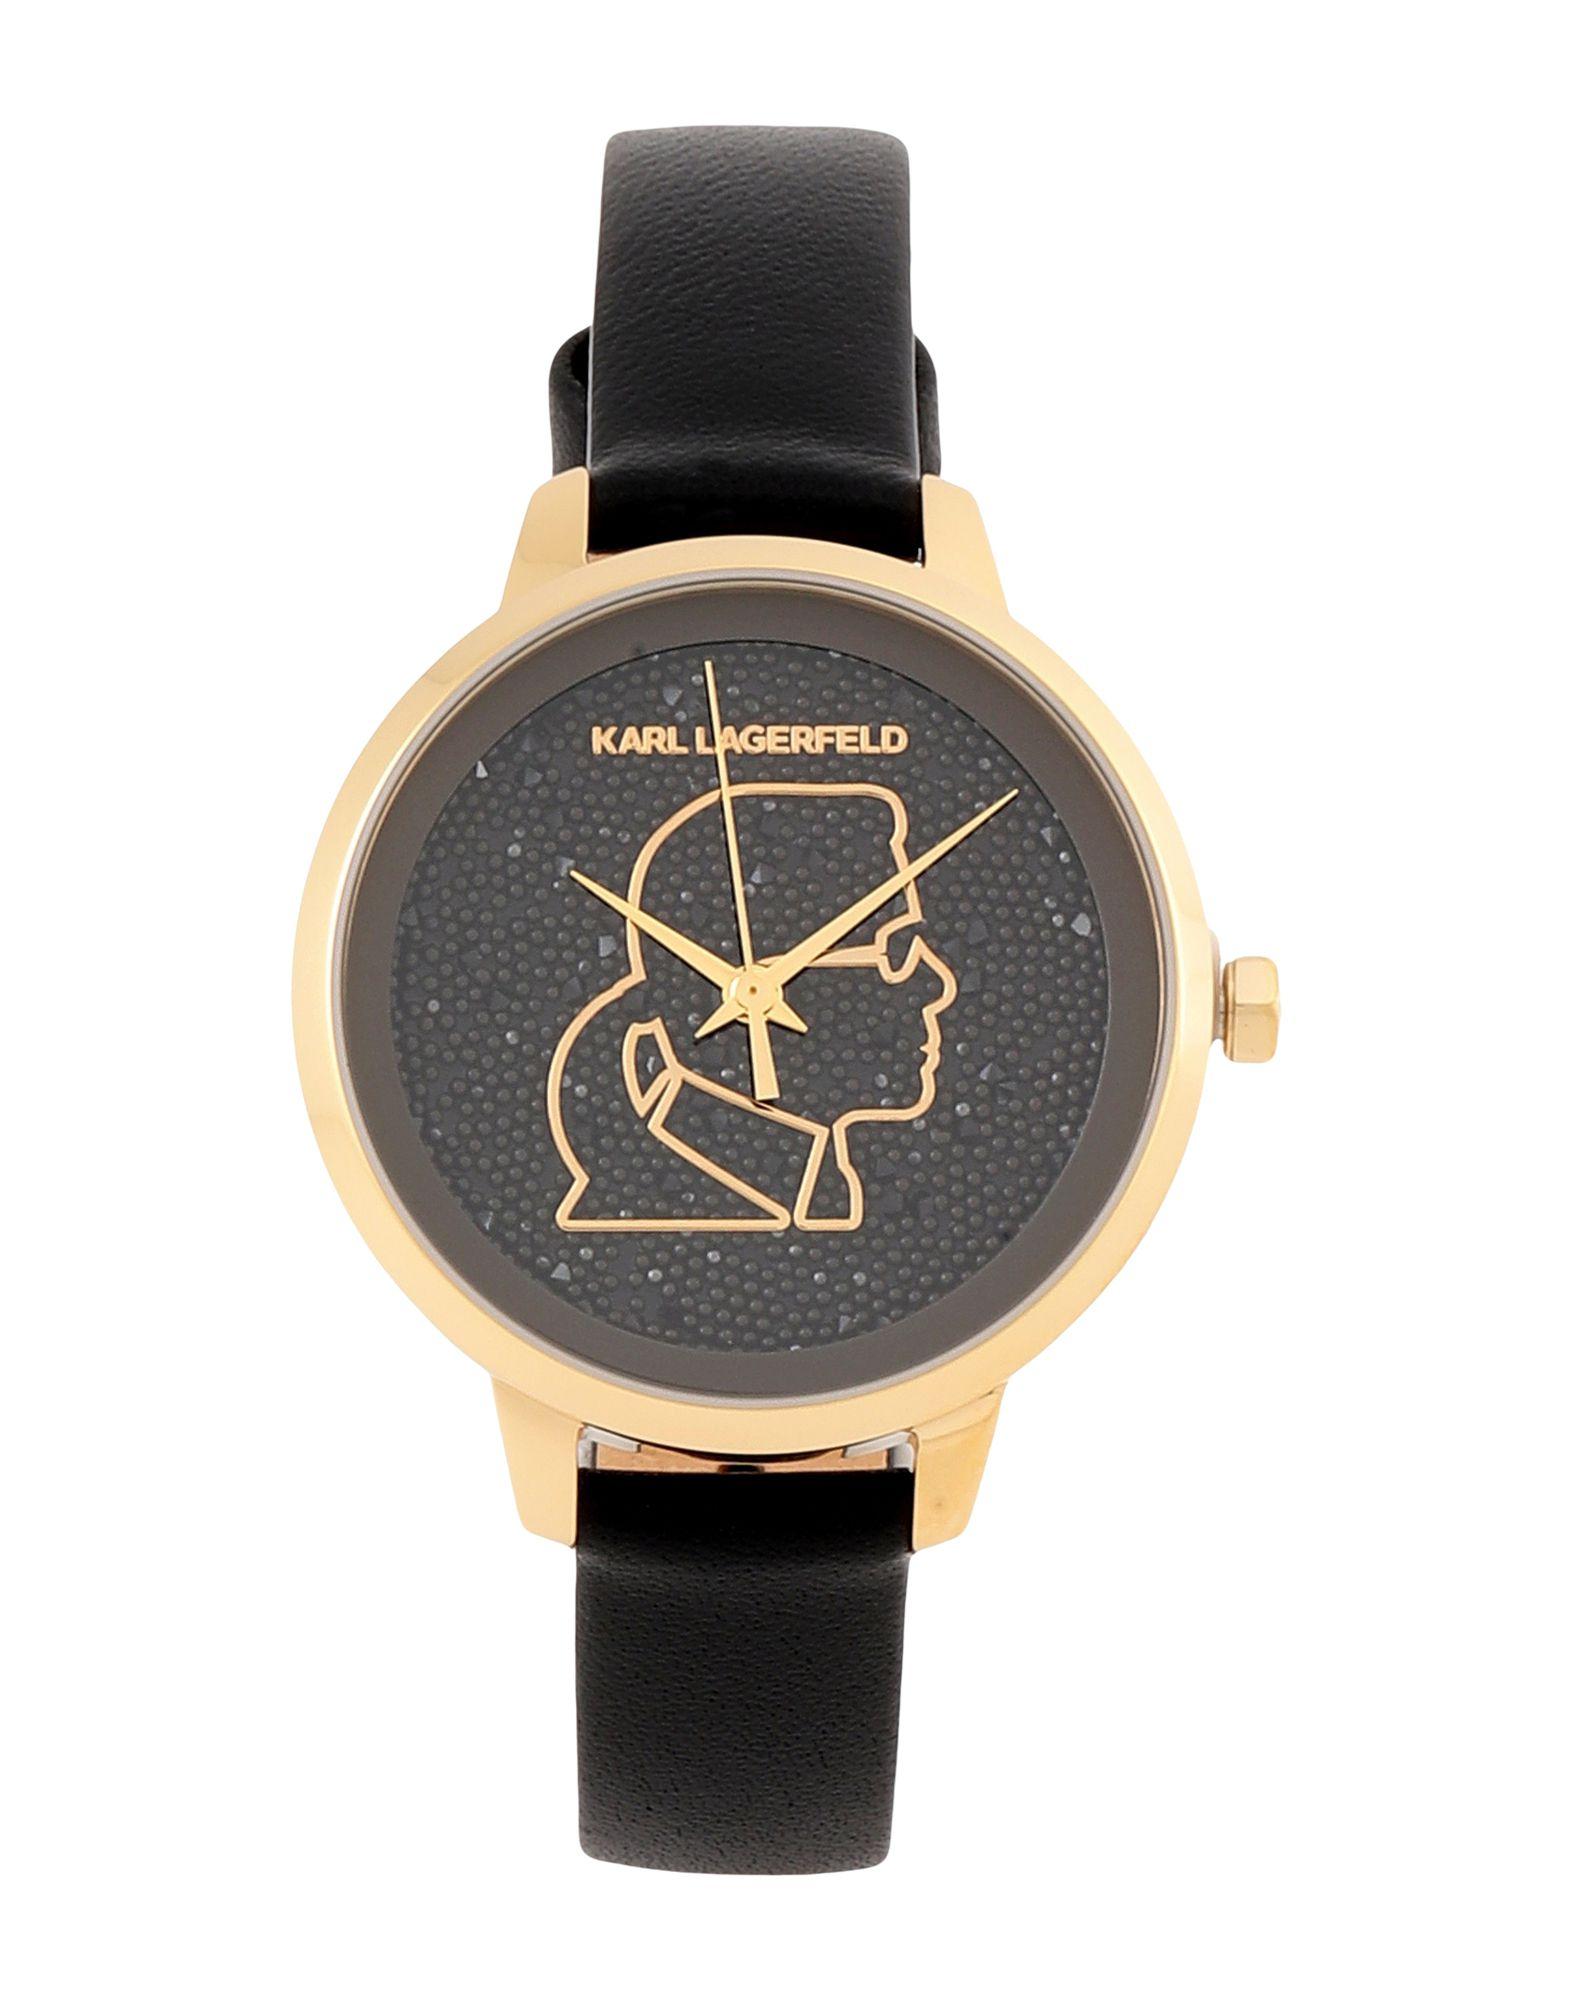 KARL LAGERFELD Wrist watches - Item 58050418